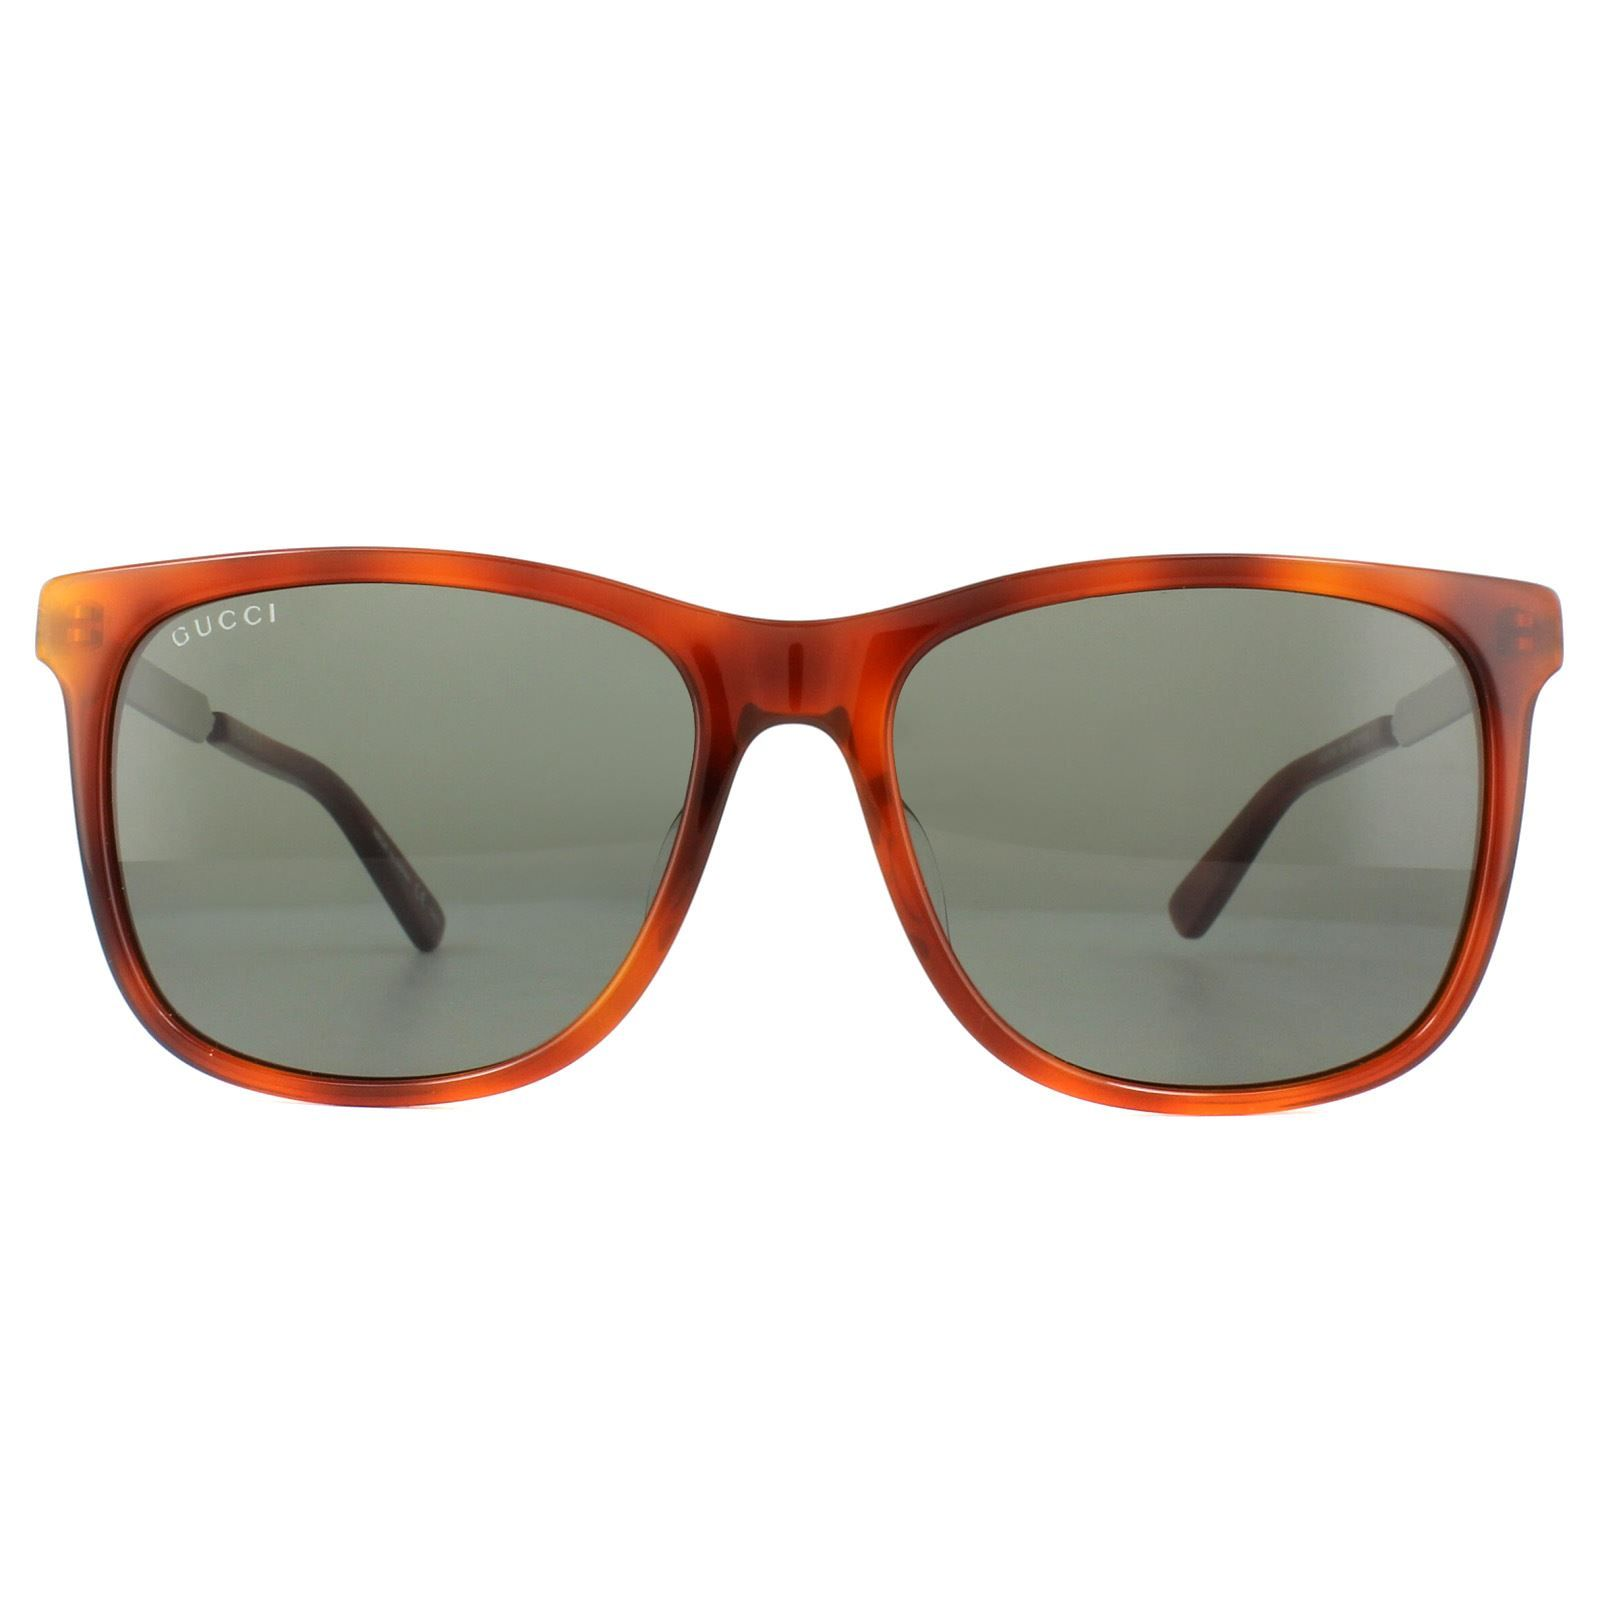 Gucci Sunglasses GG0078SK 005 Tortoise Green